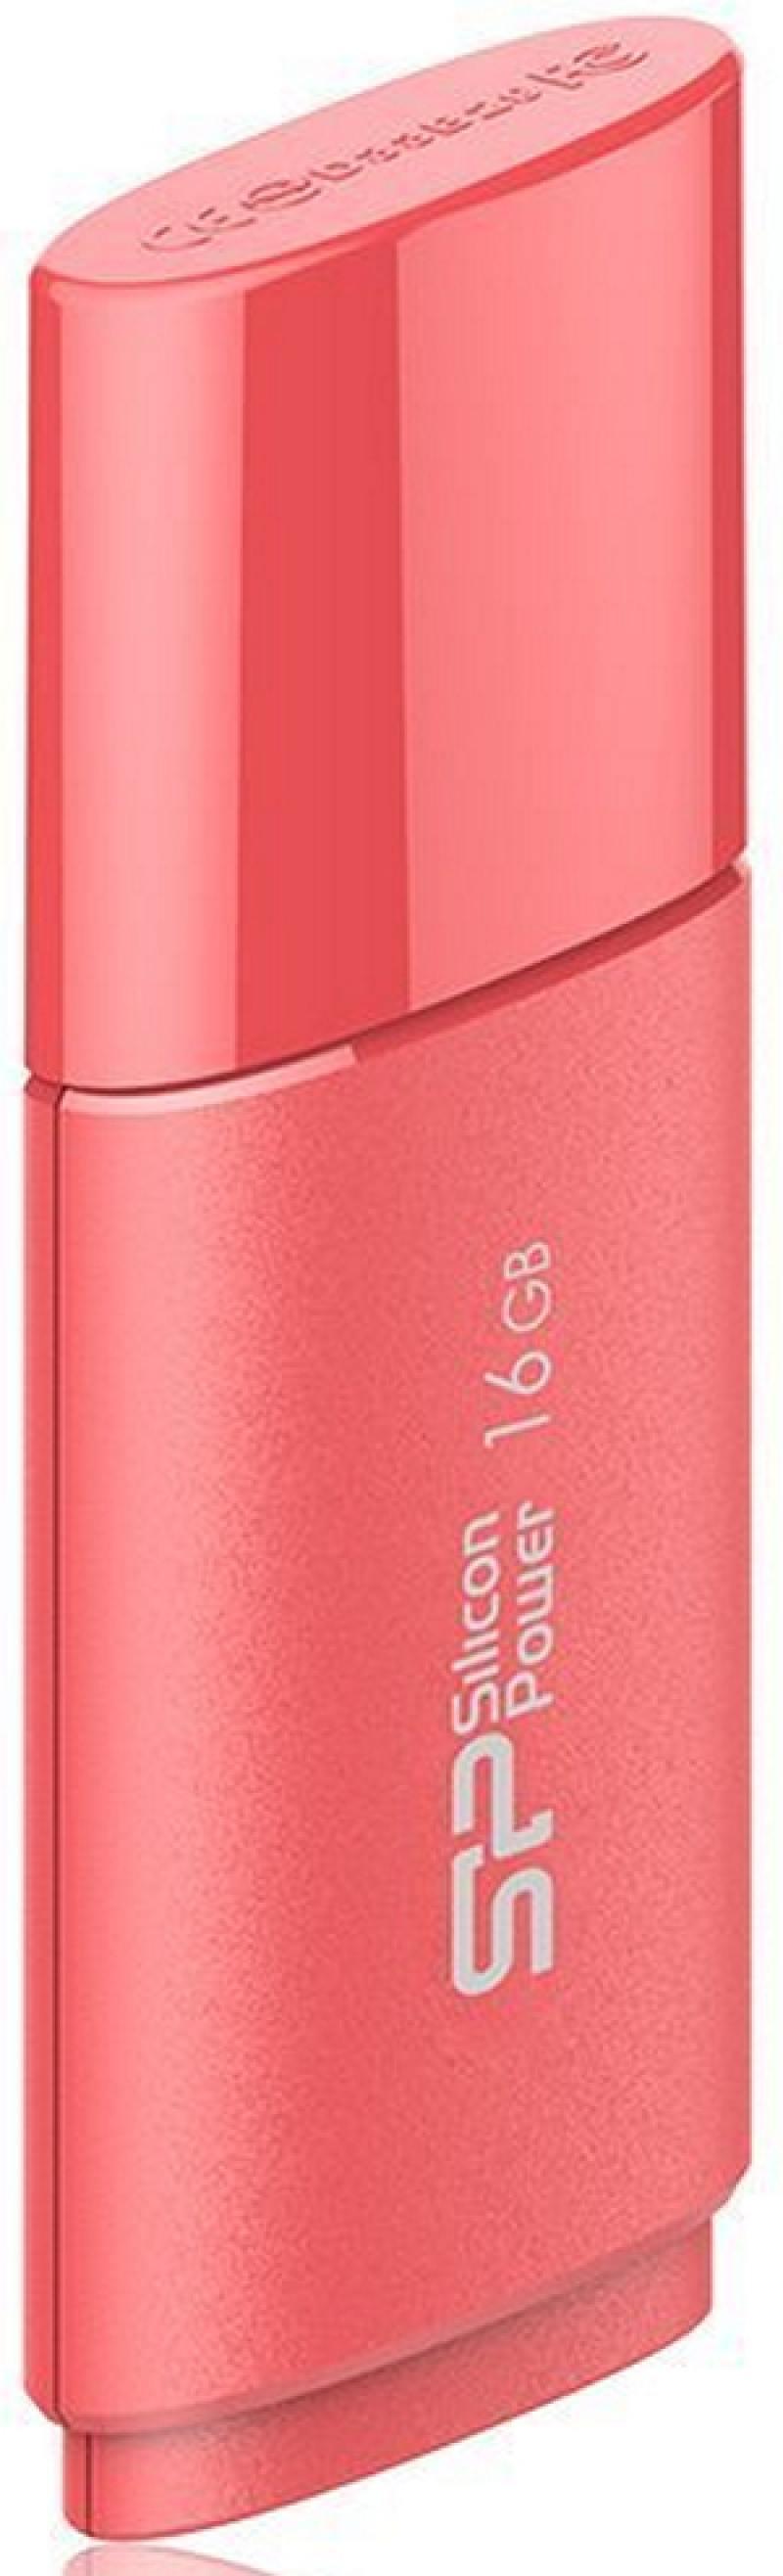 Внешний накопитель USB 16Gb Silicon Power Ultima U06 SP016GBUF2U06V1P USB2.0 peach red розовый